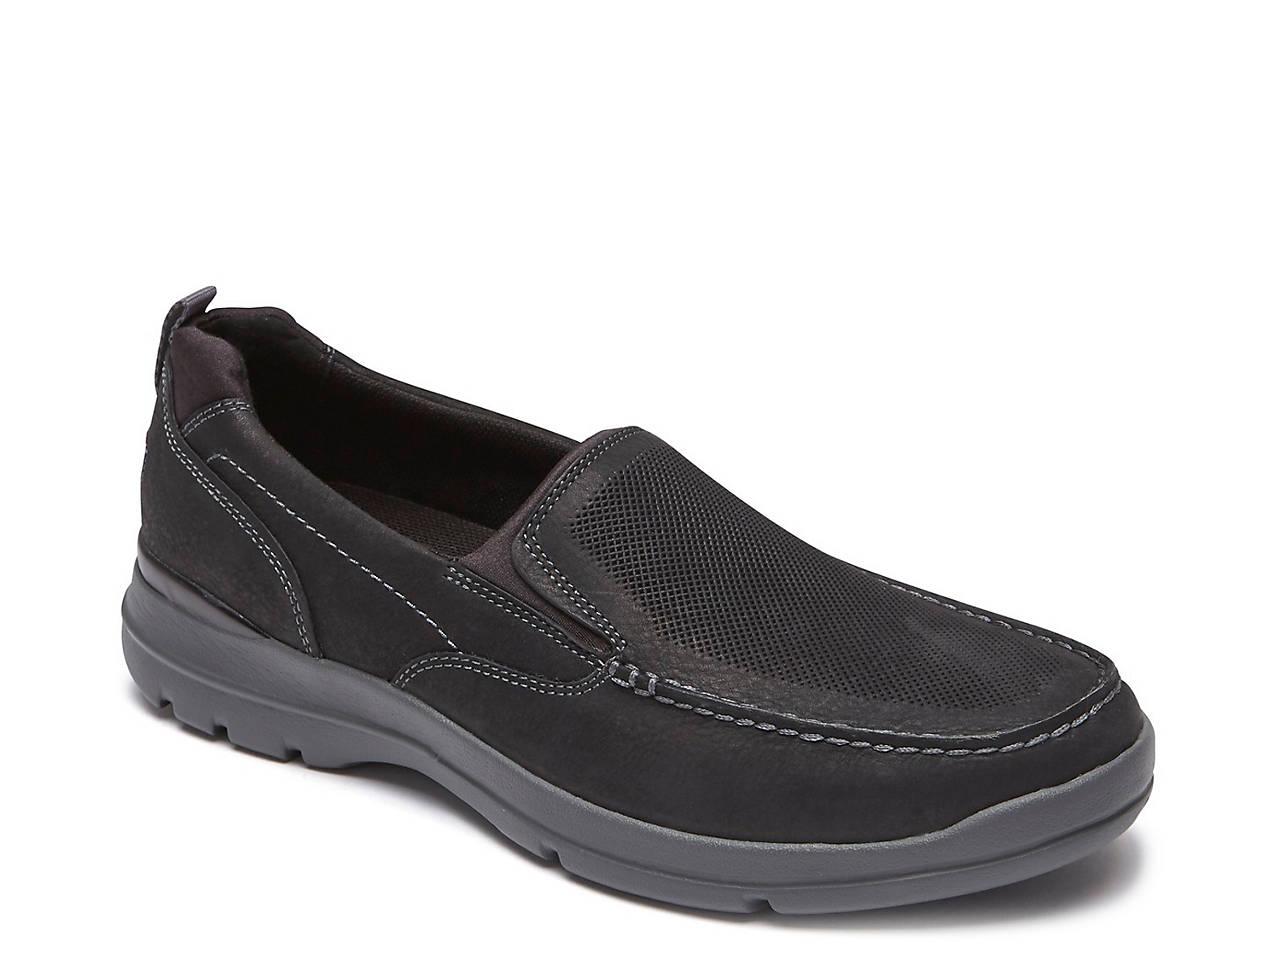 d1f47aeae795 Rockport City Edge Slip-On Men s Shoes